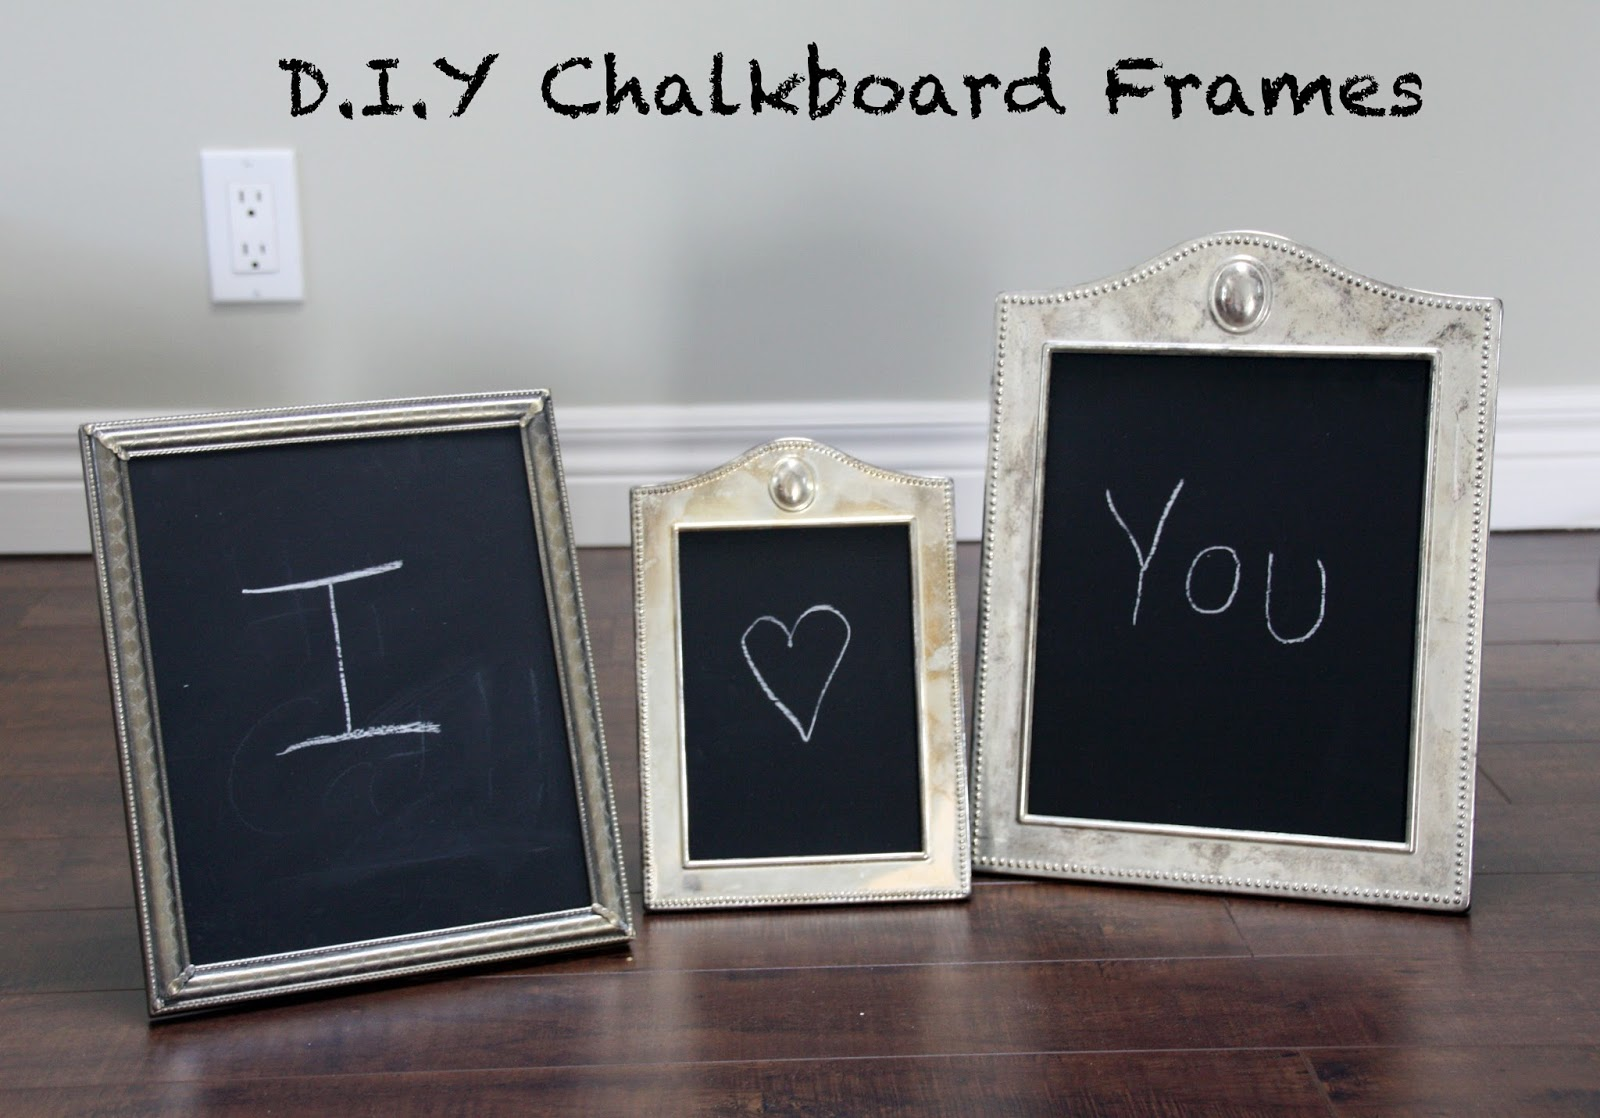 D.I.Y chalkboard frames